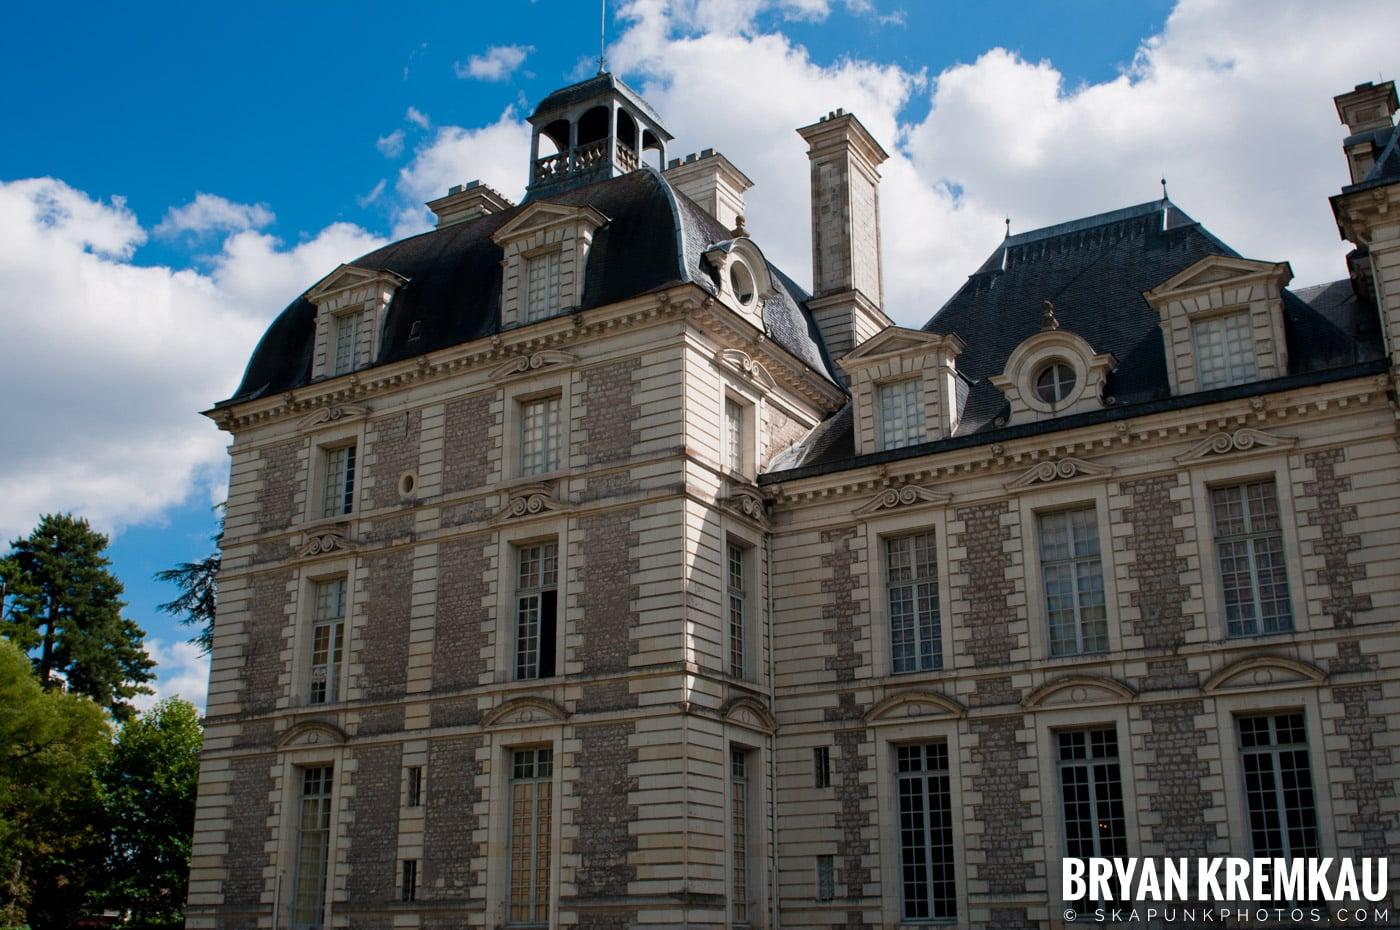 Paris, France Honeymoon - Day 7 - 7.24.11 (11)